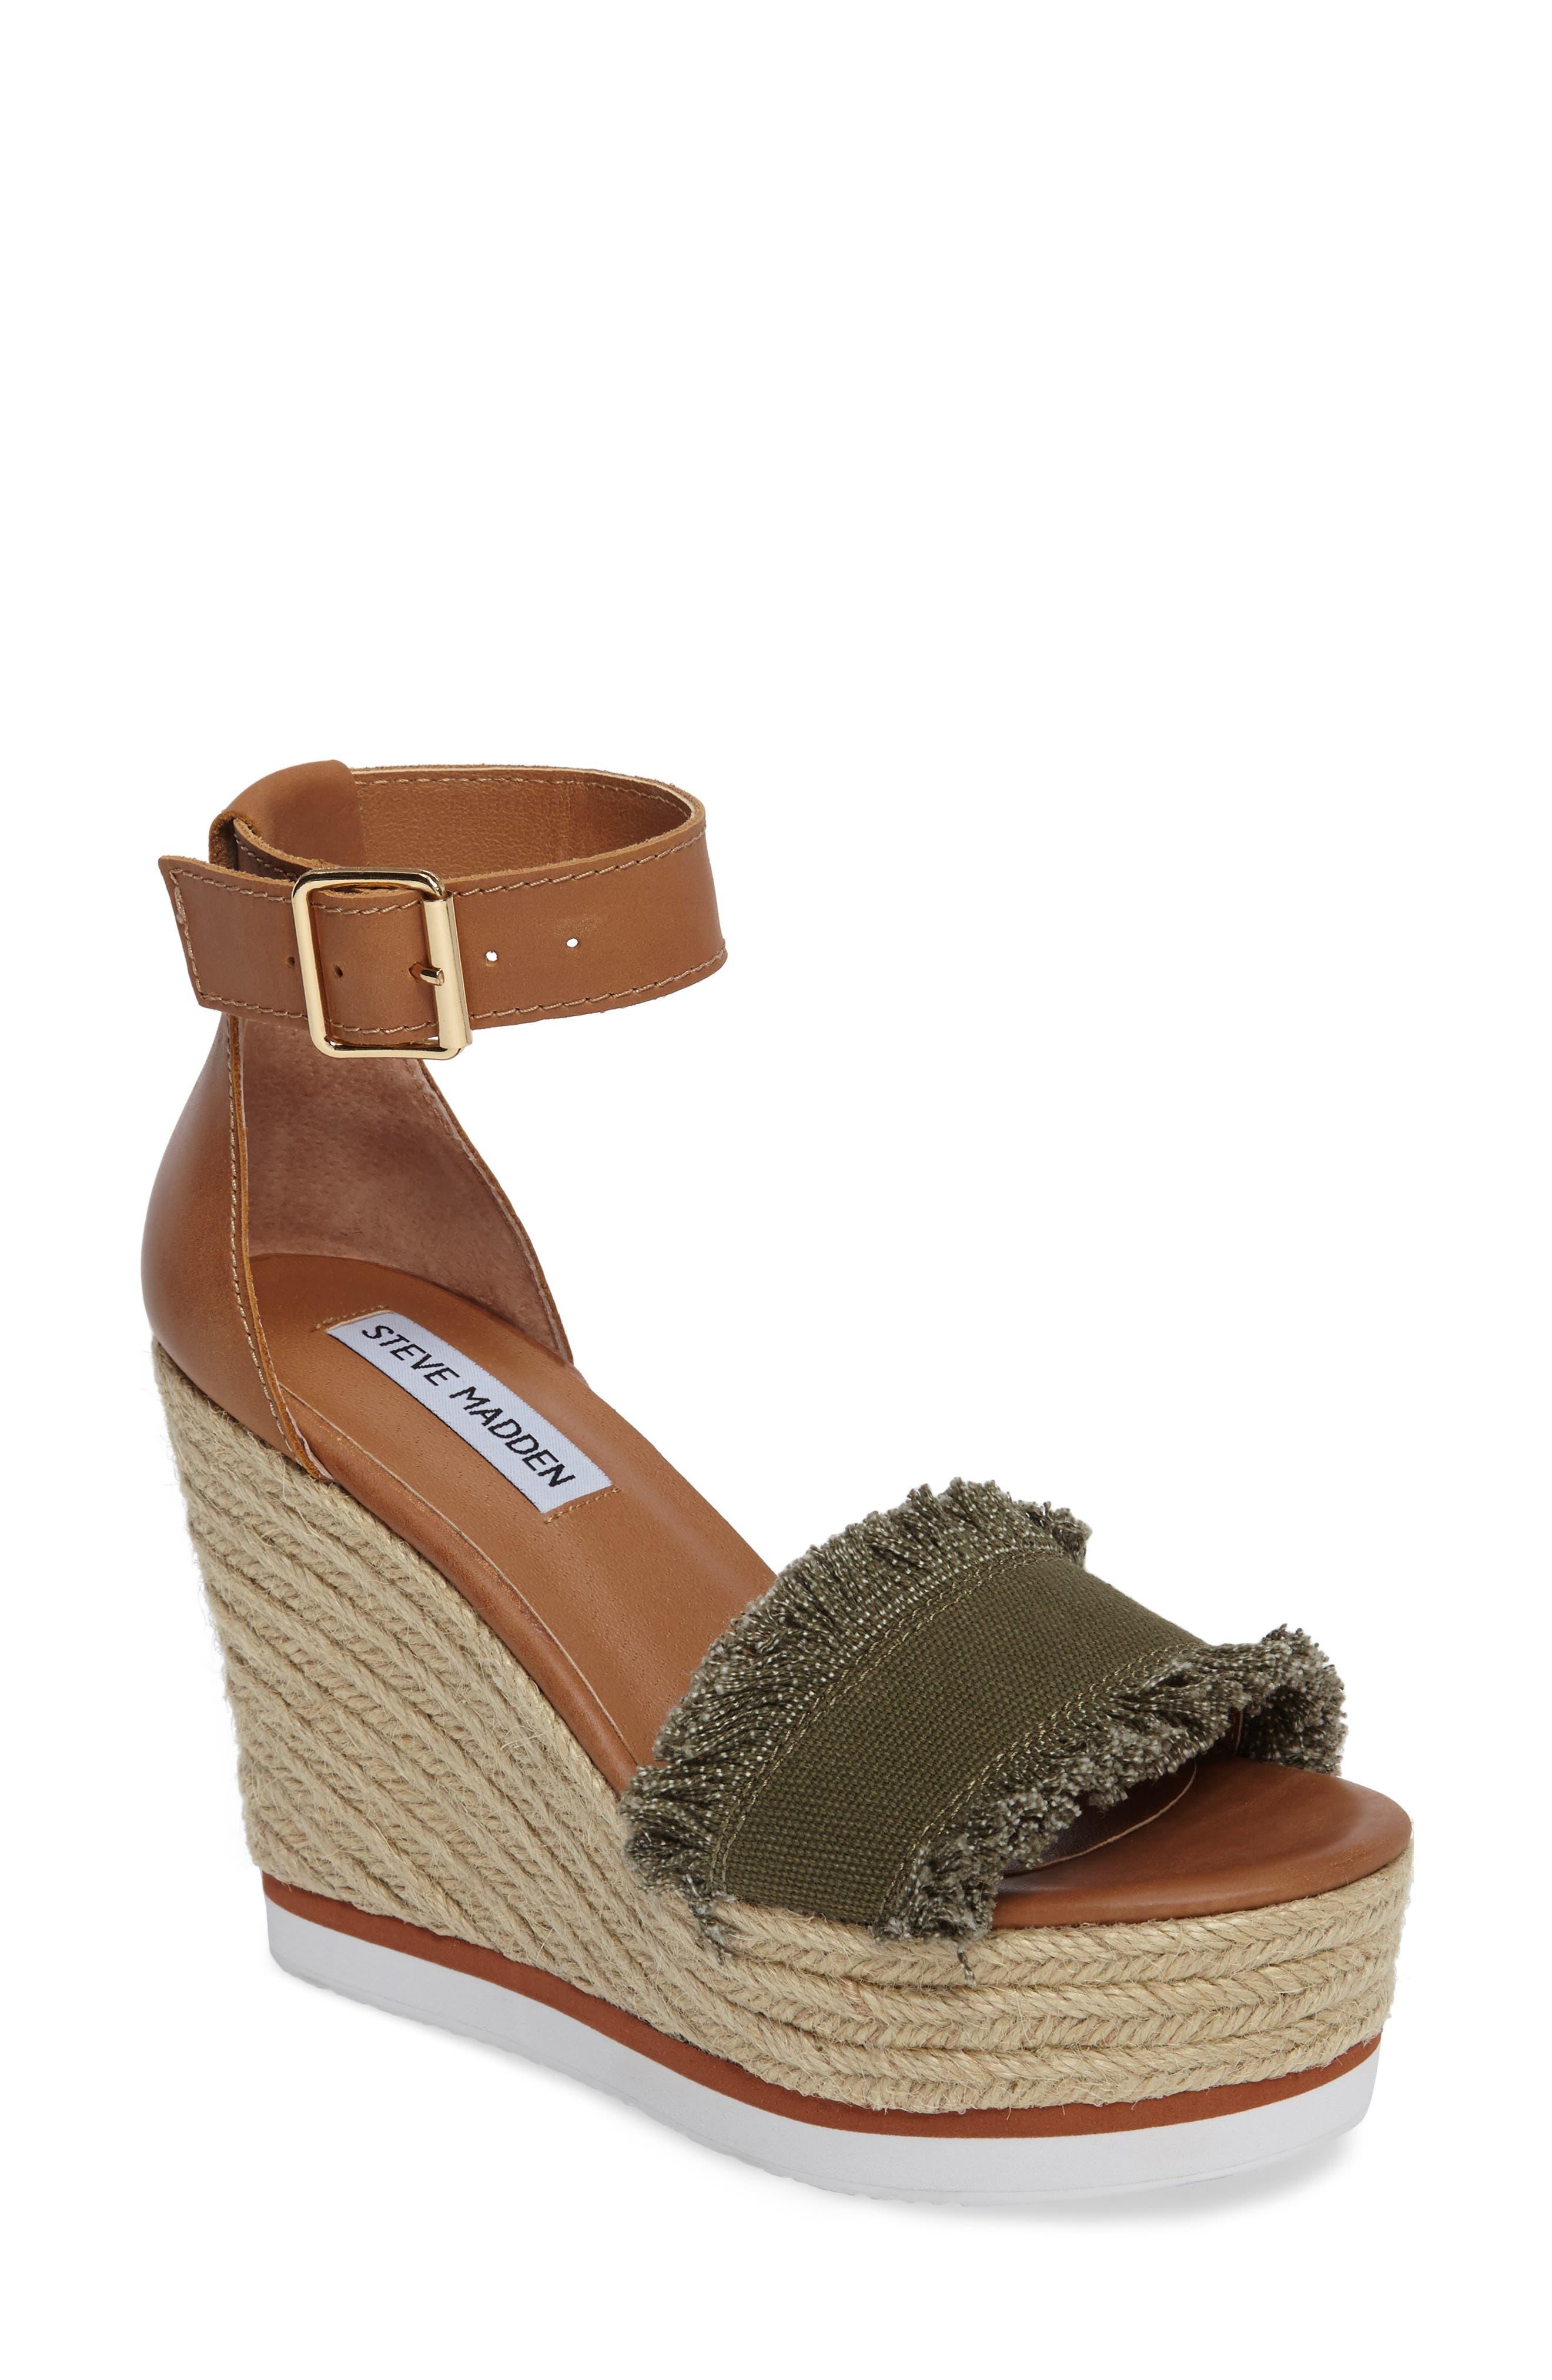 Valley Fringed Platform Wedge Sandal,                             Main thumbnail 1, color,                             Olive Fab